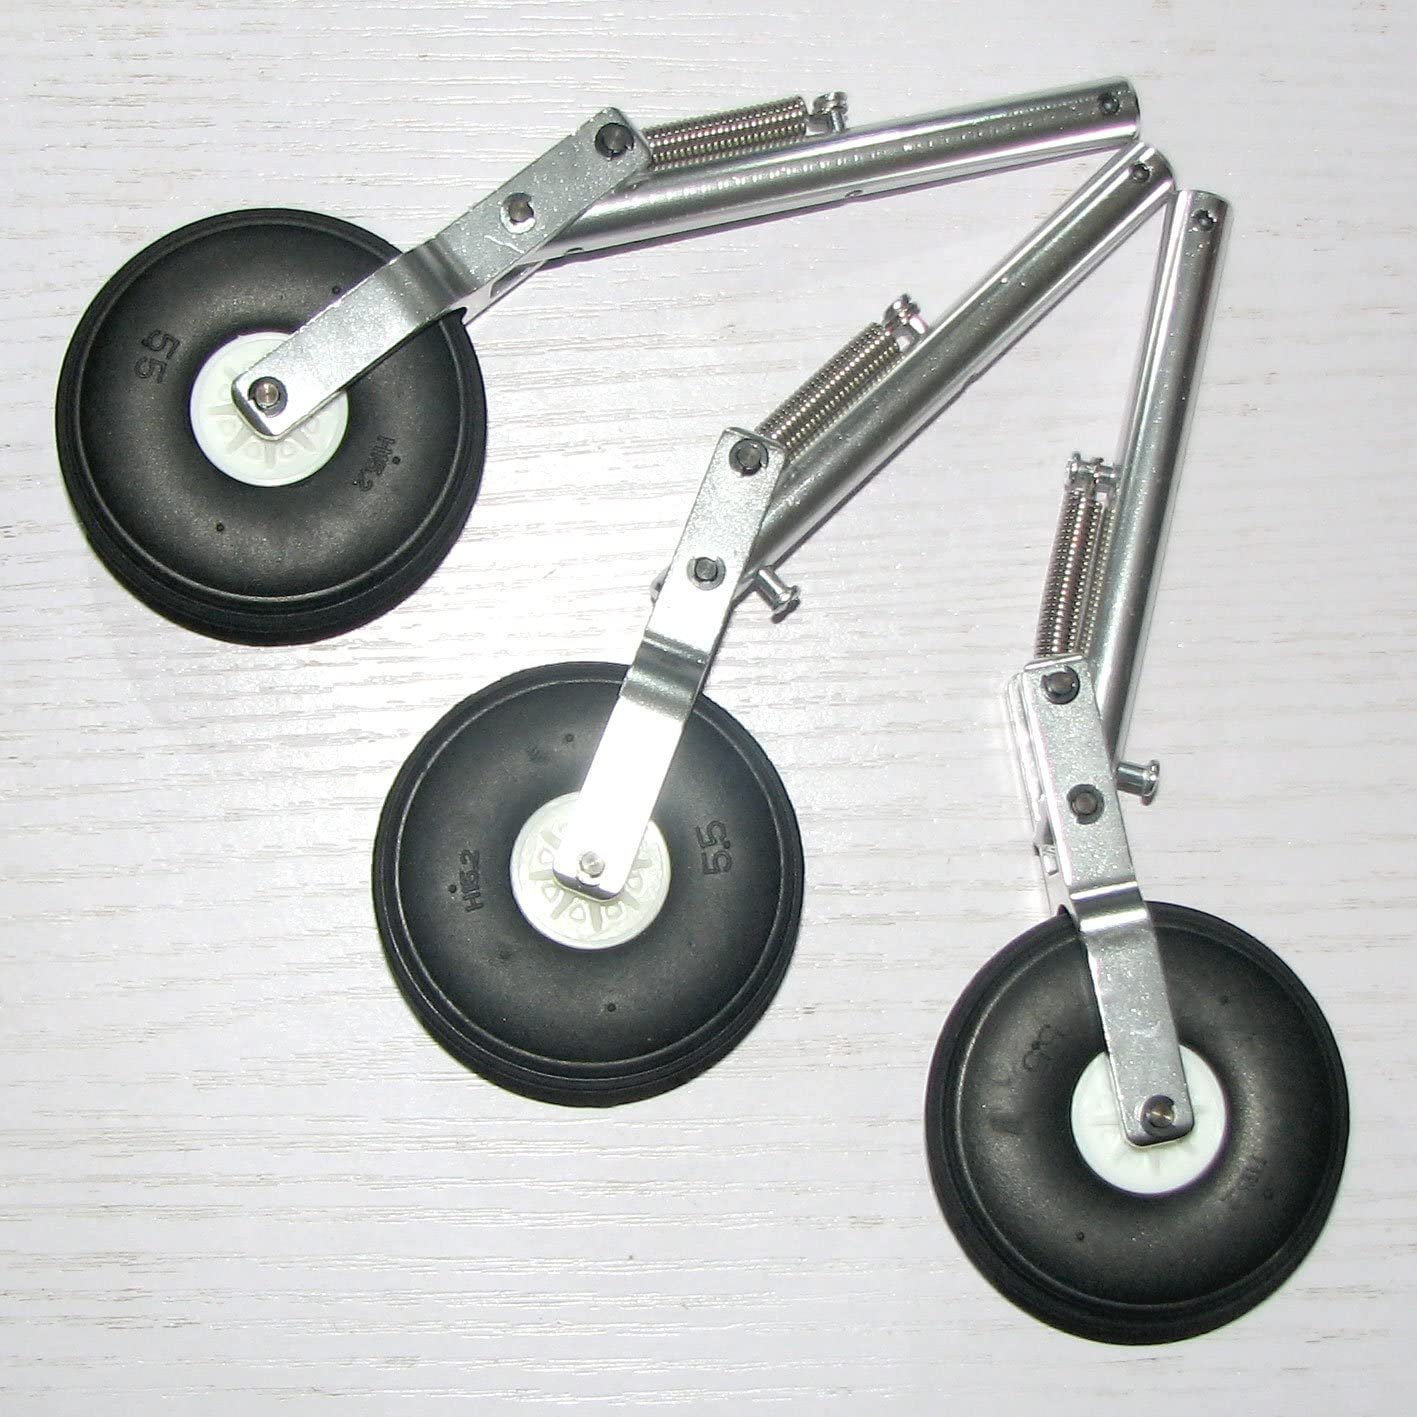 MD 150mm Alum Offset Oleo Struts Landing Gear 5mm Recording with PU tyre